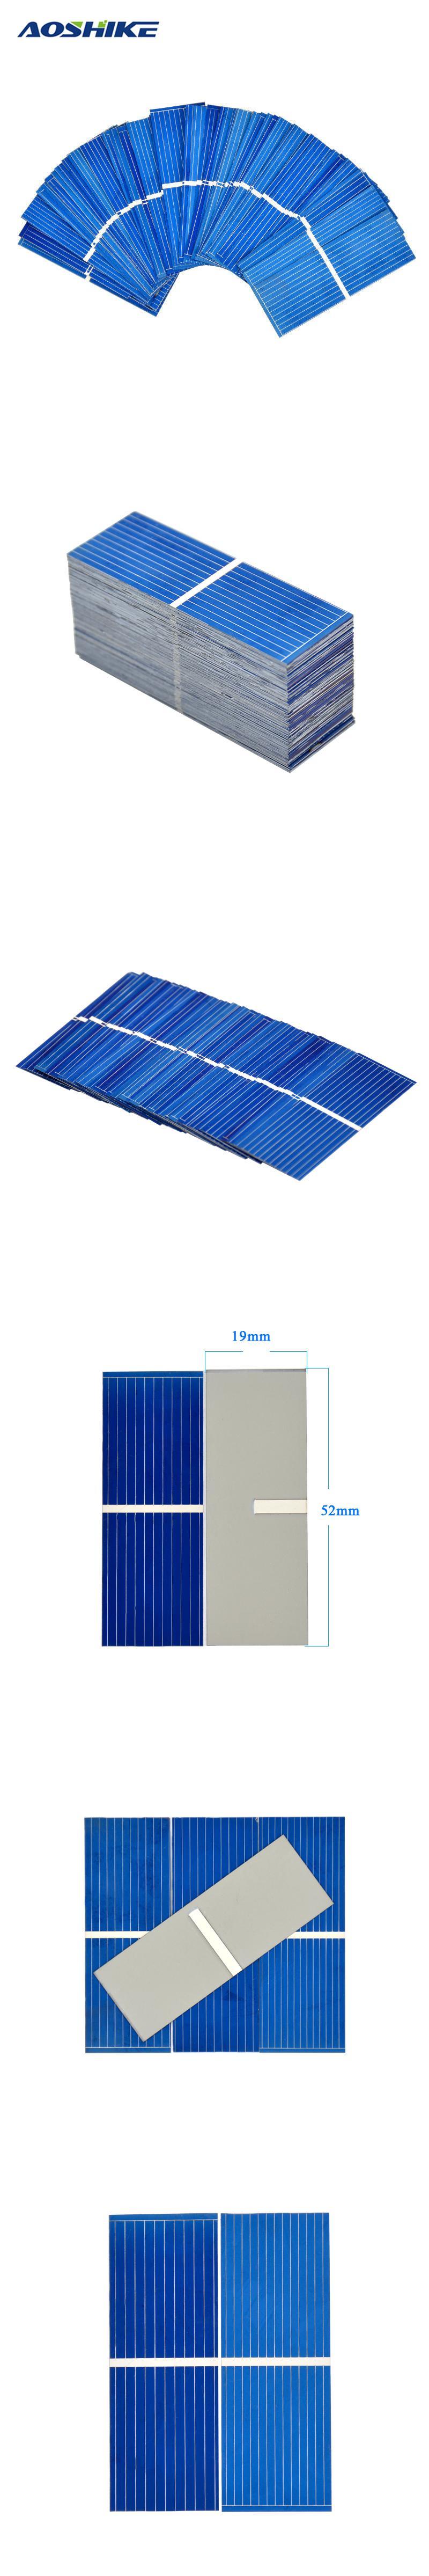 100pcs 0 5 v solar panel 52 19mm polycrystalline silicon